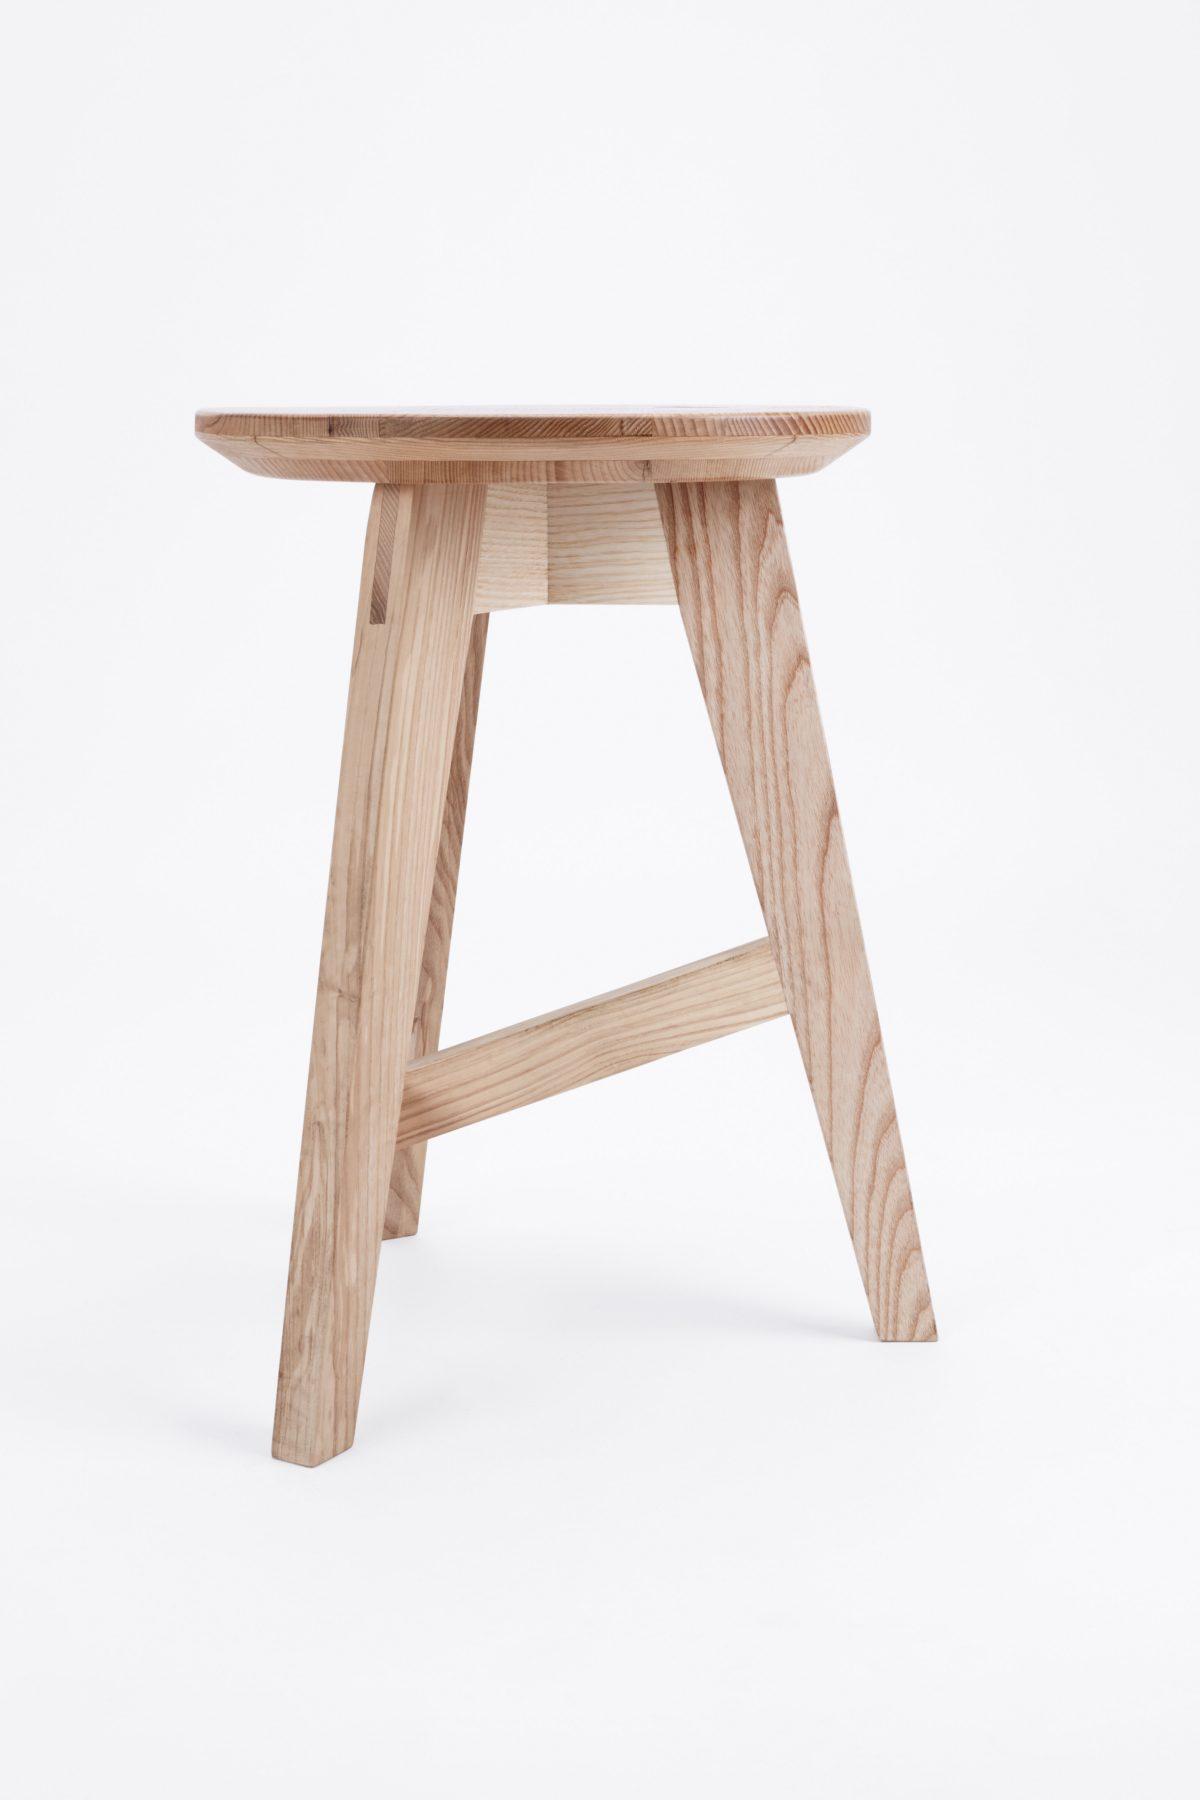 Jan Hendzel Studio college stool-3